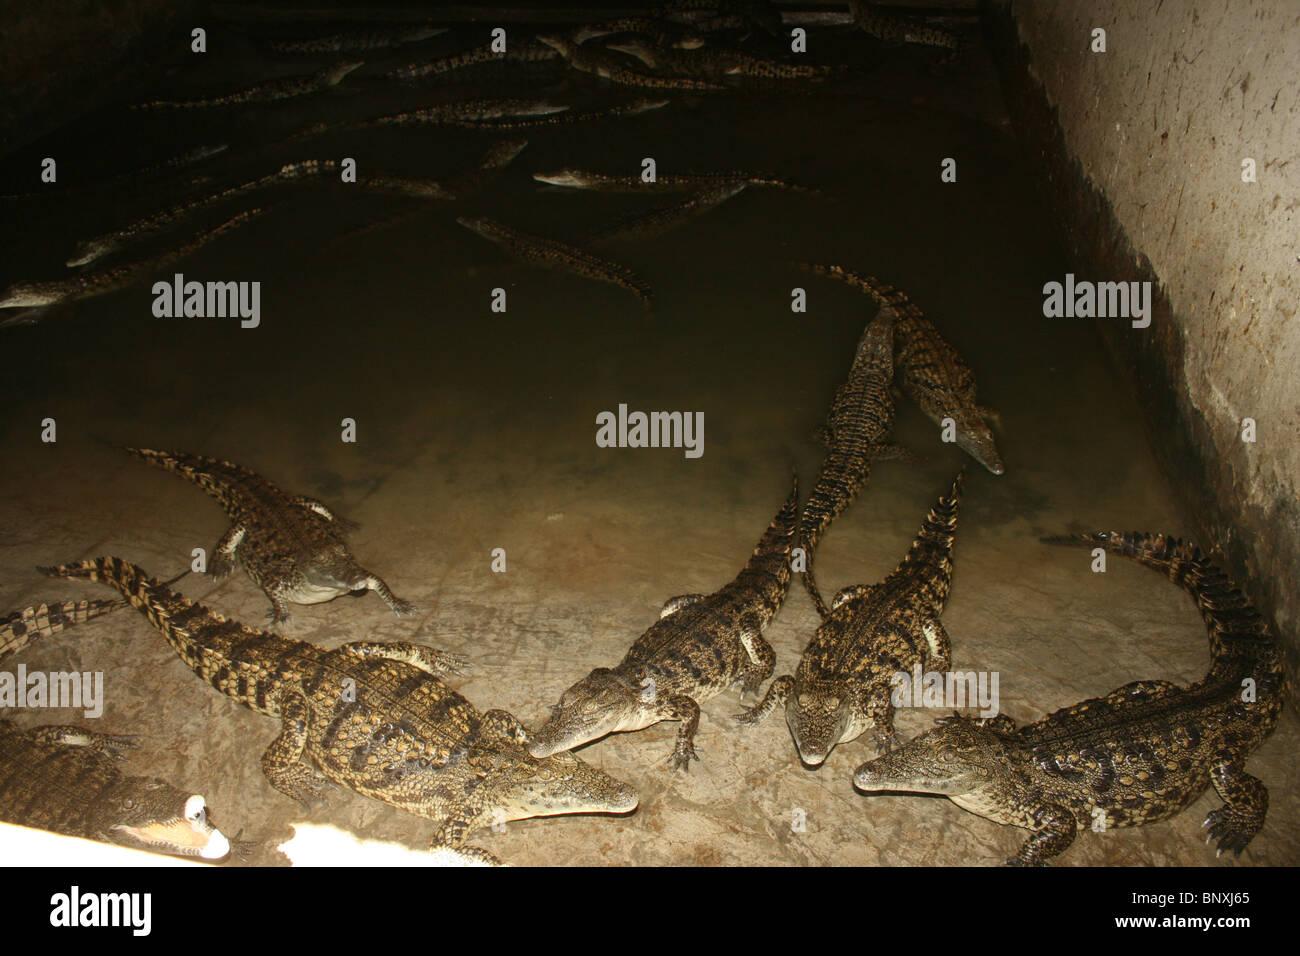 Nile crocodiles at a crocodile farm in Uganda - Stock Image